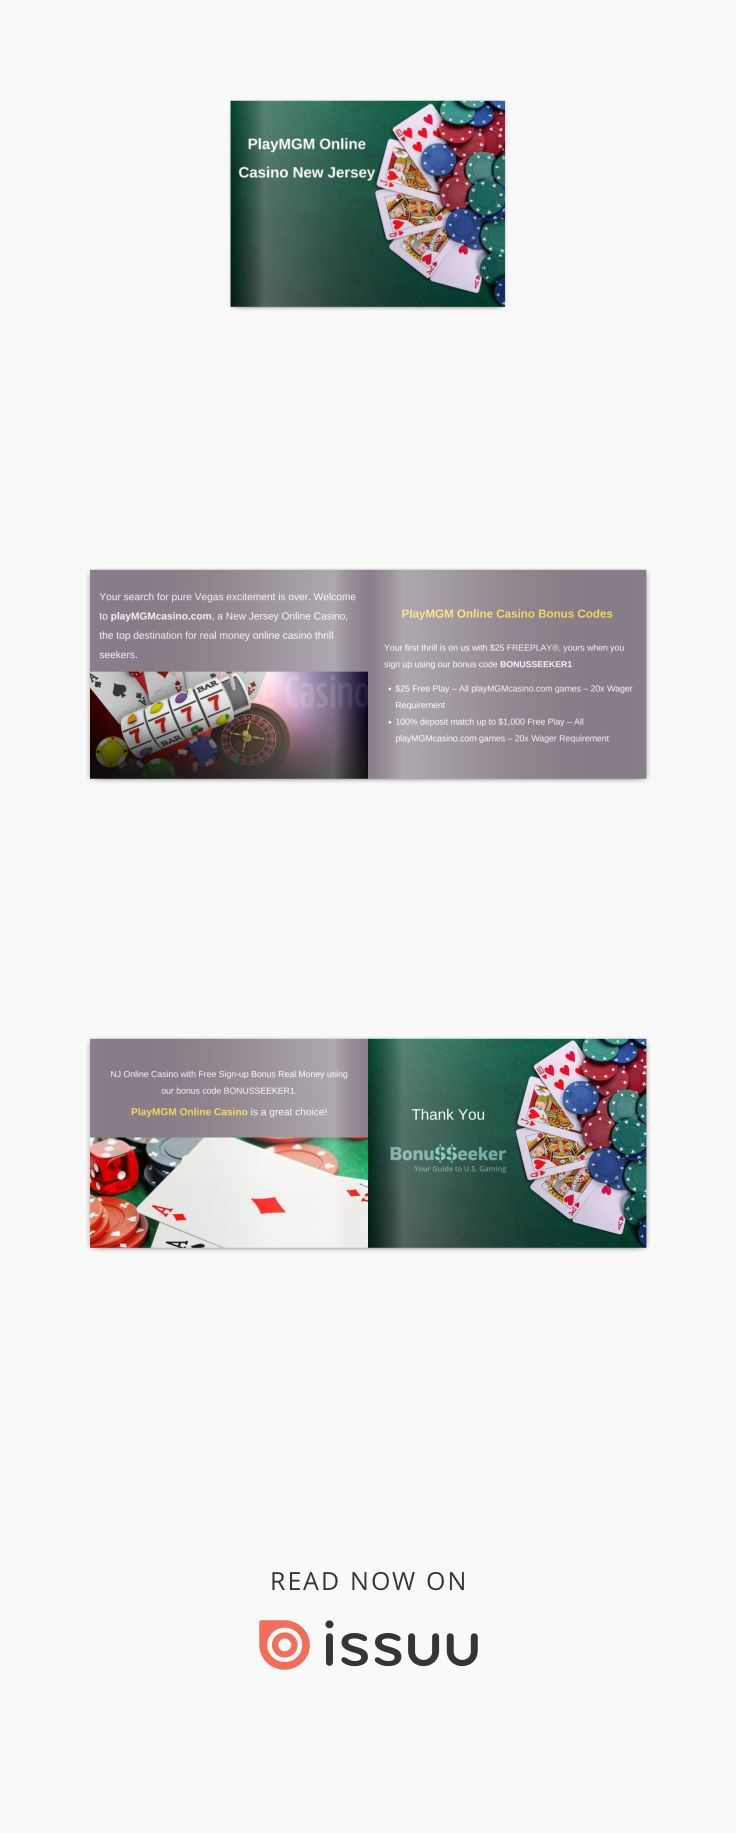 Play mgm online casino new jersey Online casino, Casino